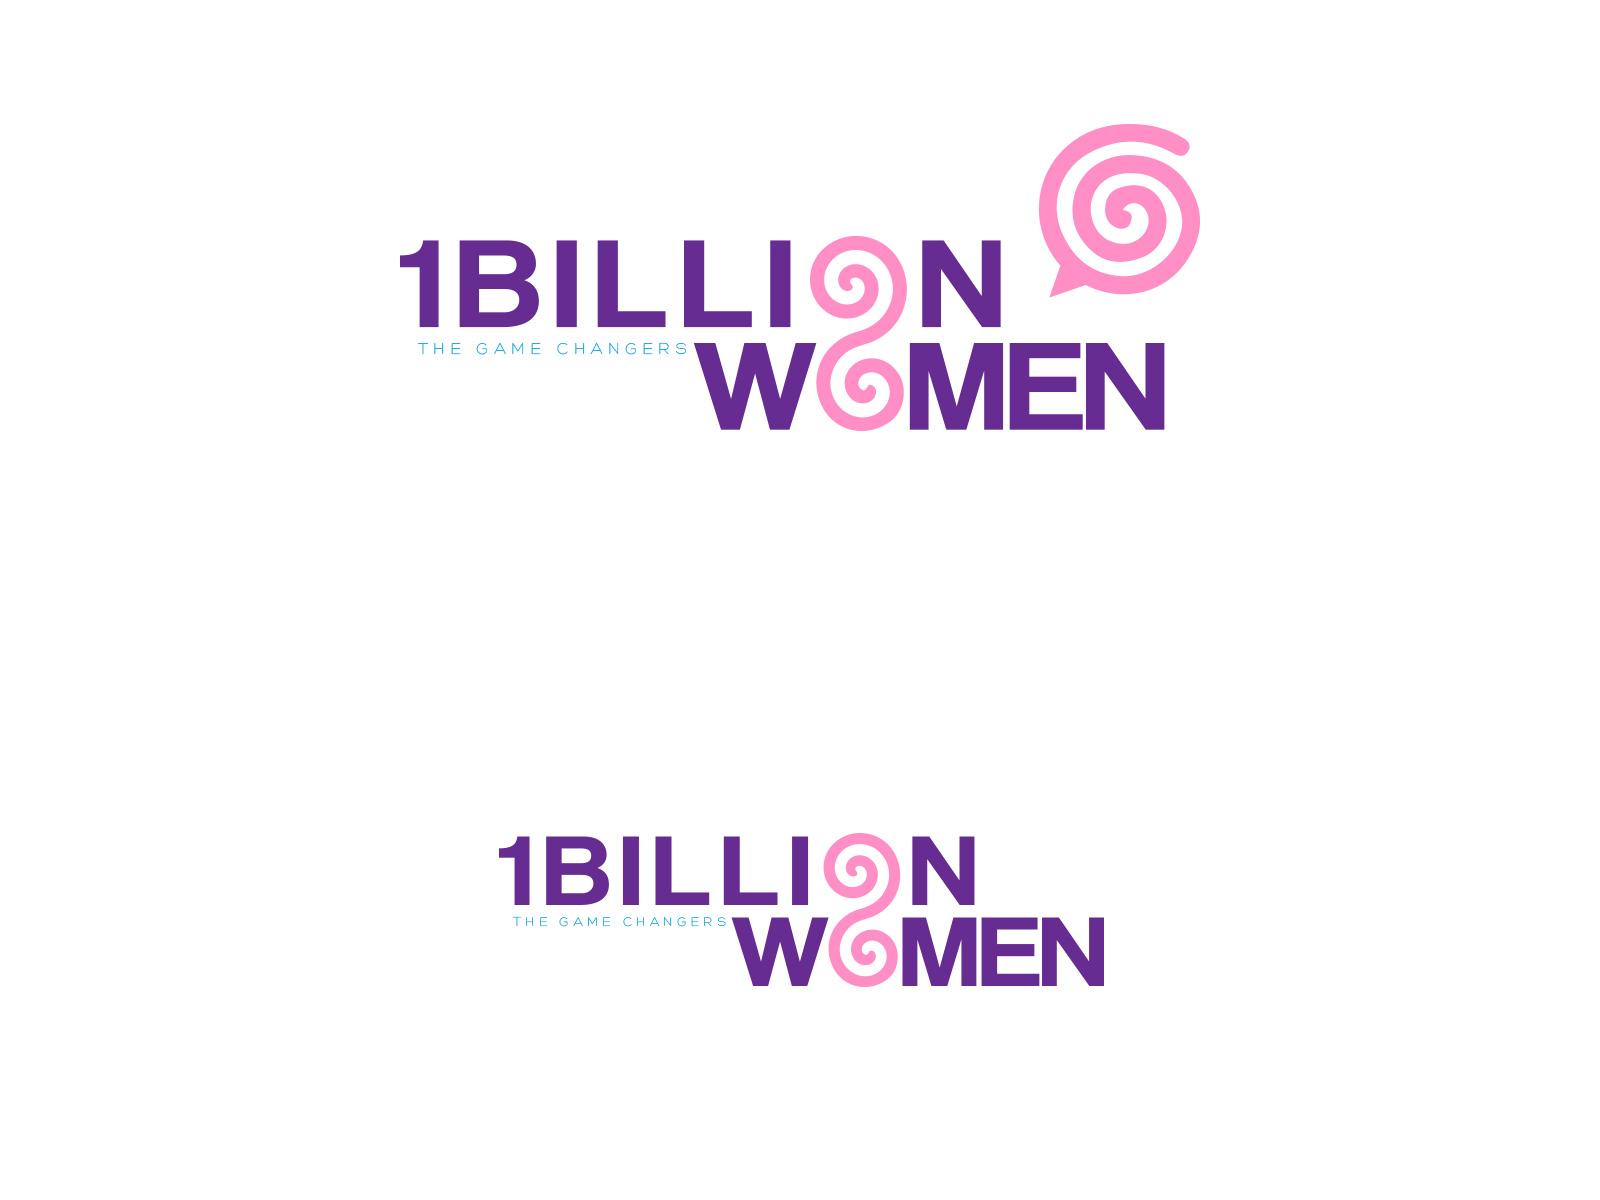 Logo Design by olii - Entry No. 139 in the Logo Design Contest Fun Logo Design for 1BillionWomen.